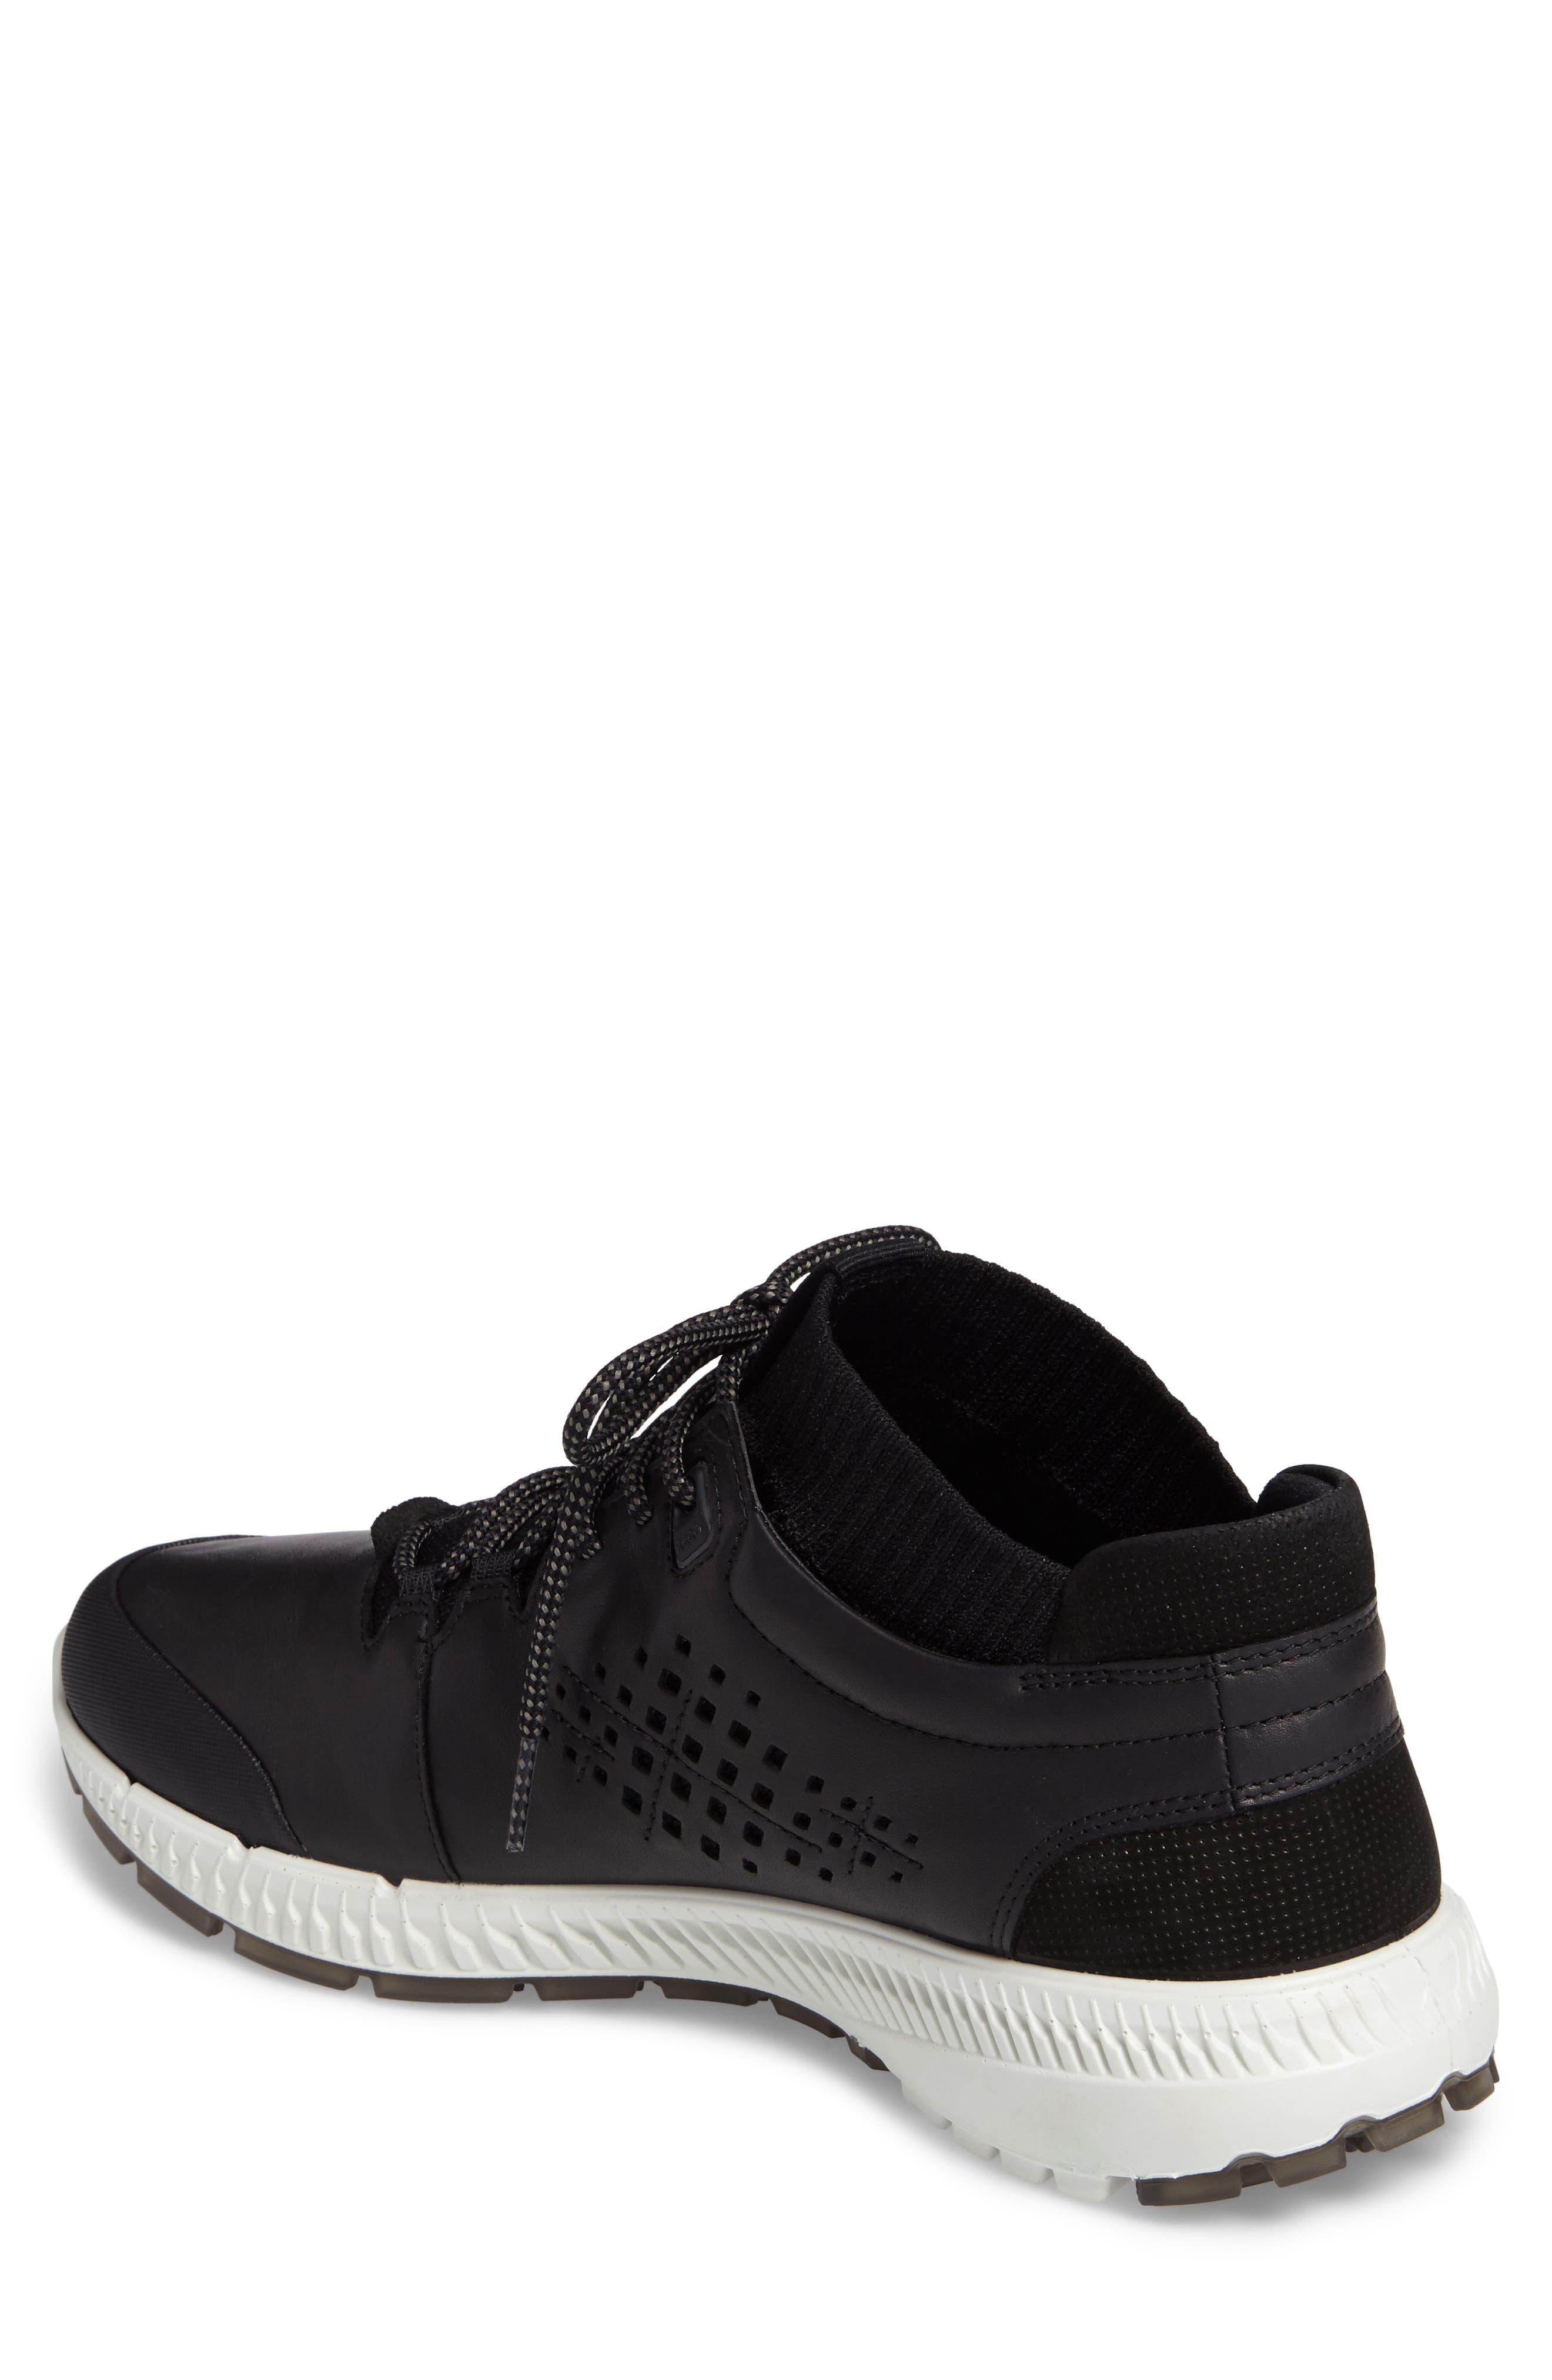 Alternate Image 2  - Ecco Intrinsic Mid Sneaker (Men)